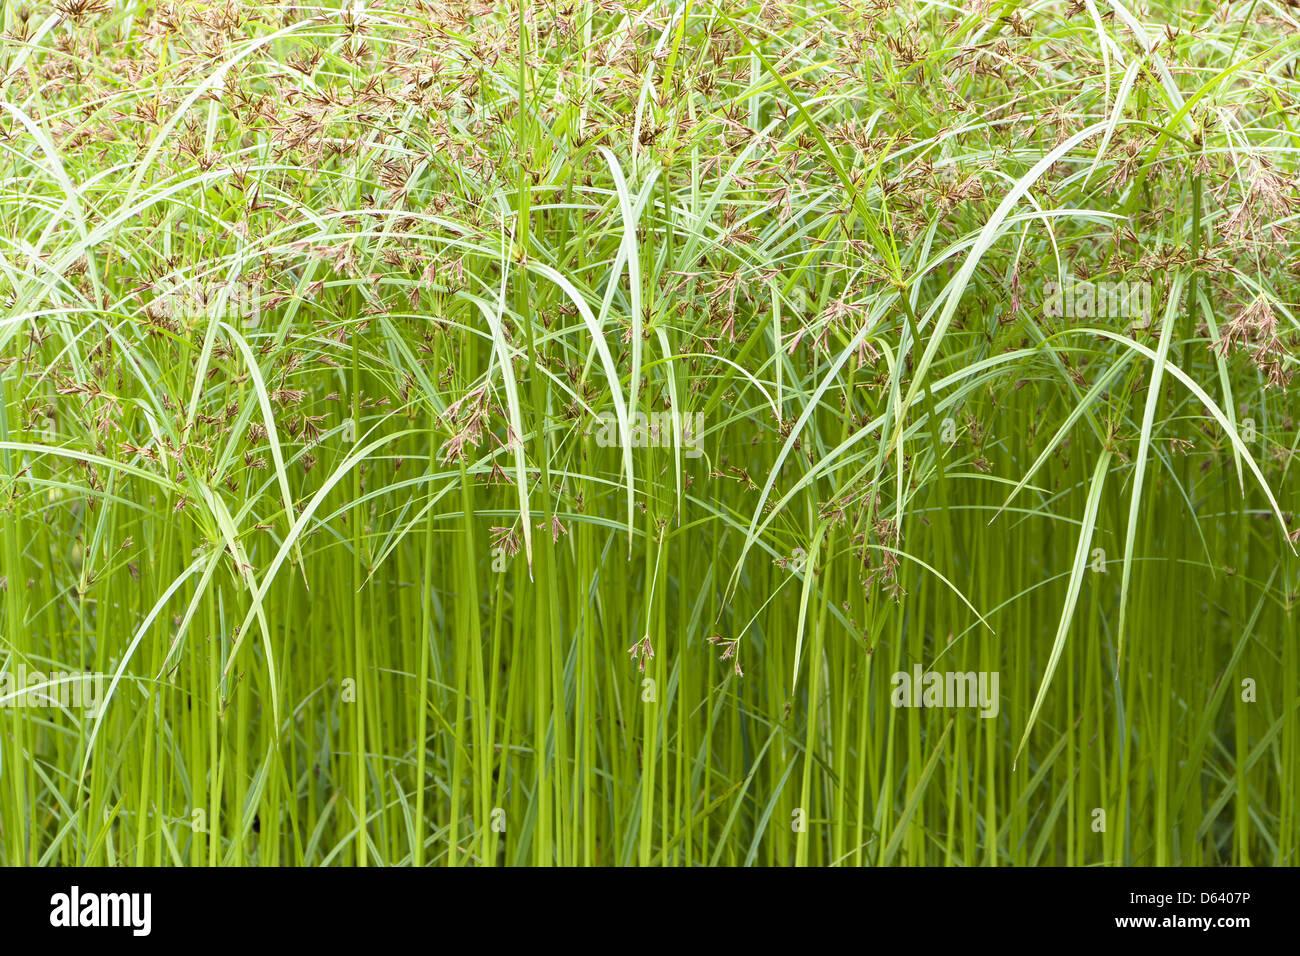 cyperus - Stock Image